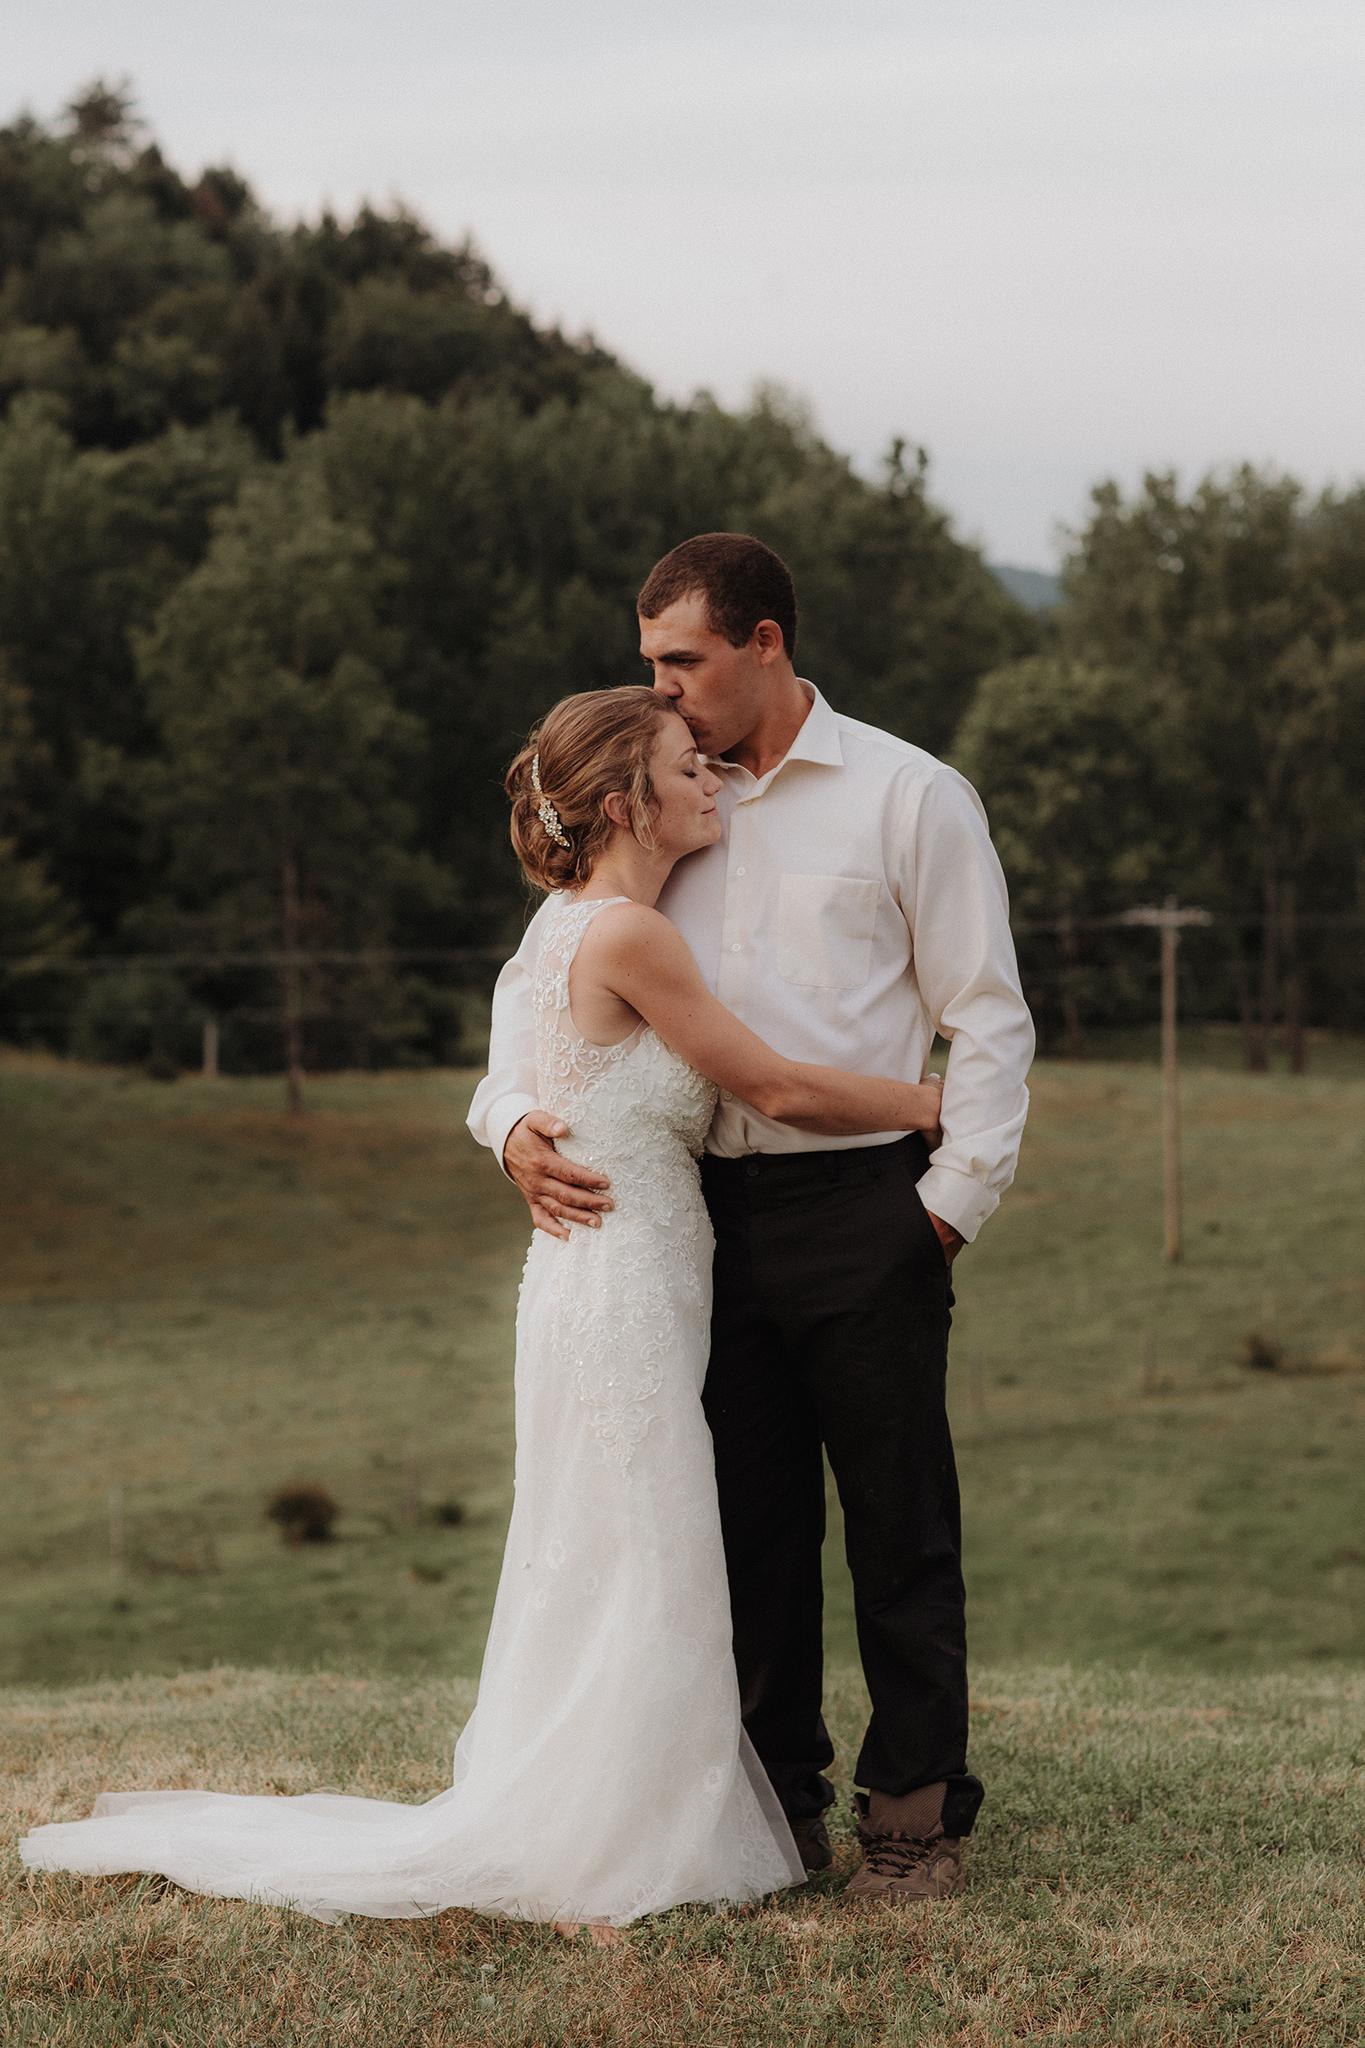 vermont-wedding-photographer-outdoor-farm-wedding-73.jpg